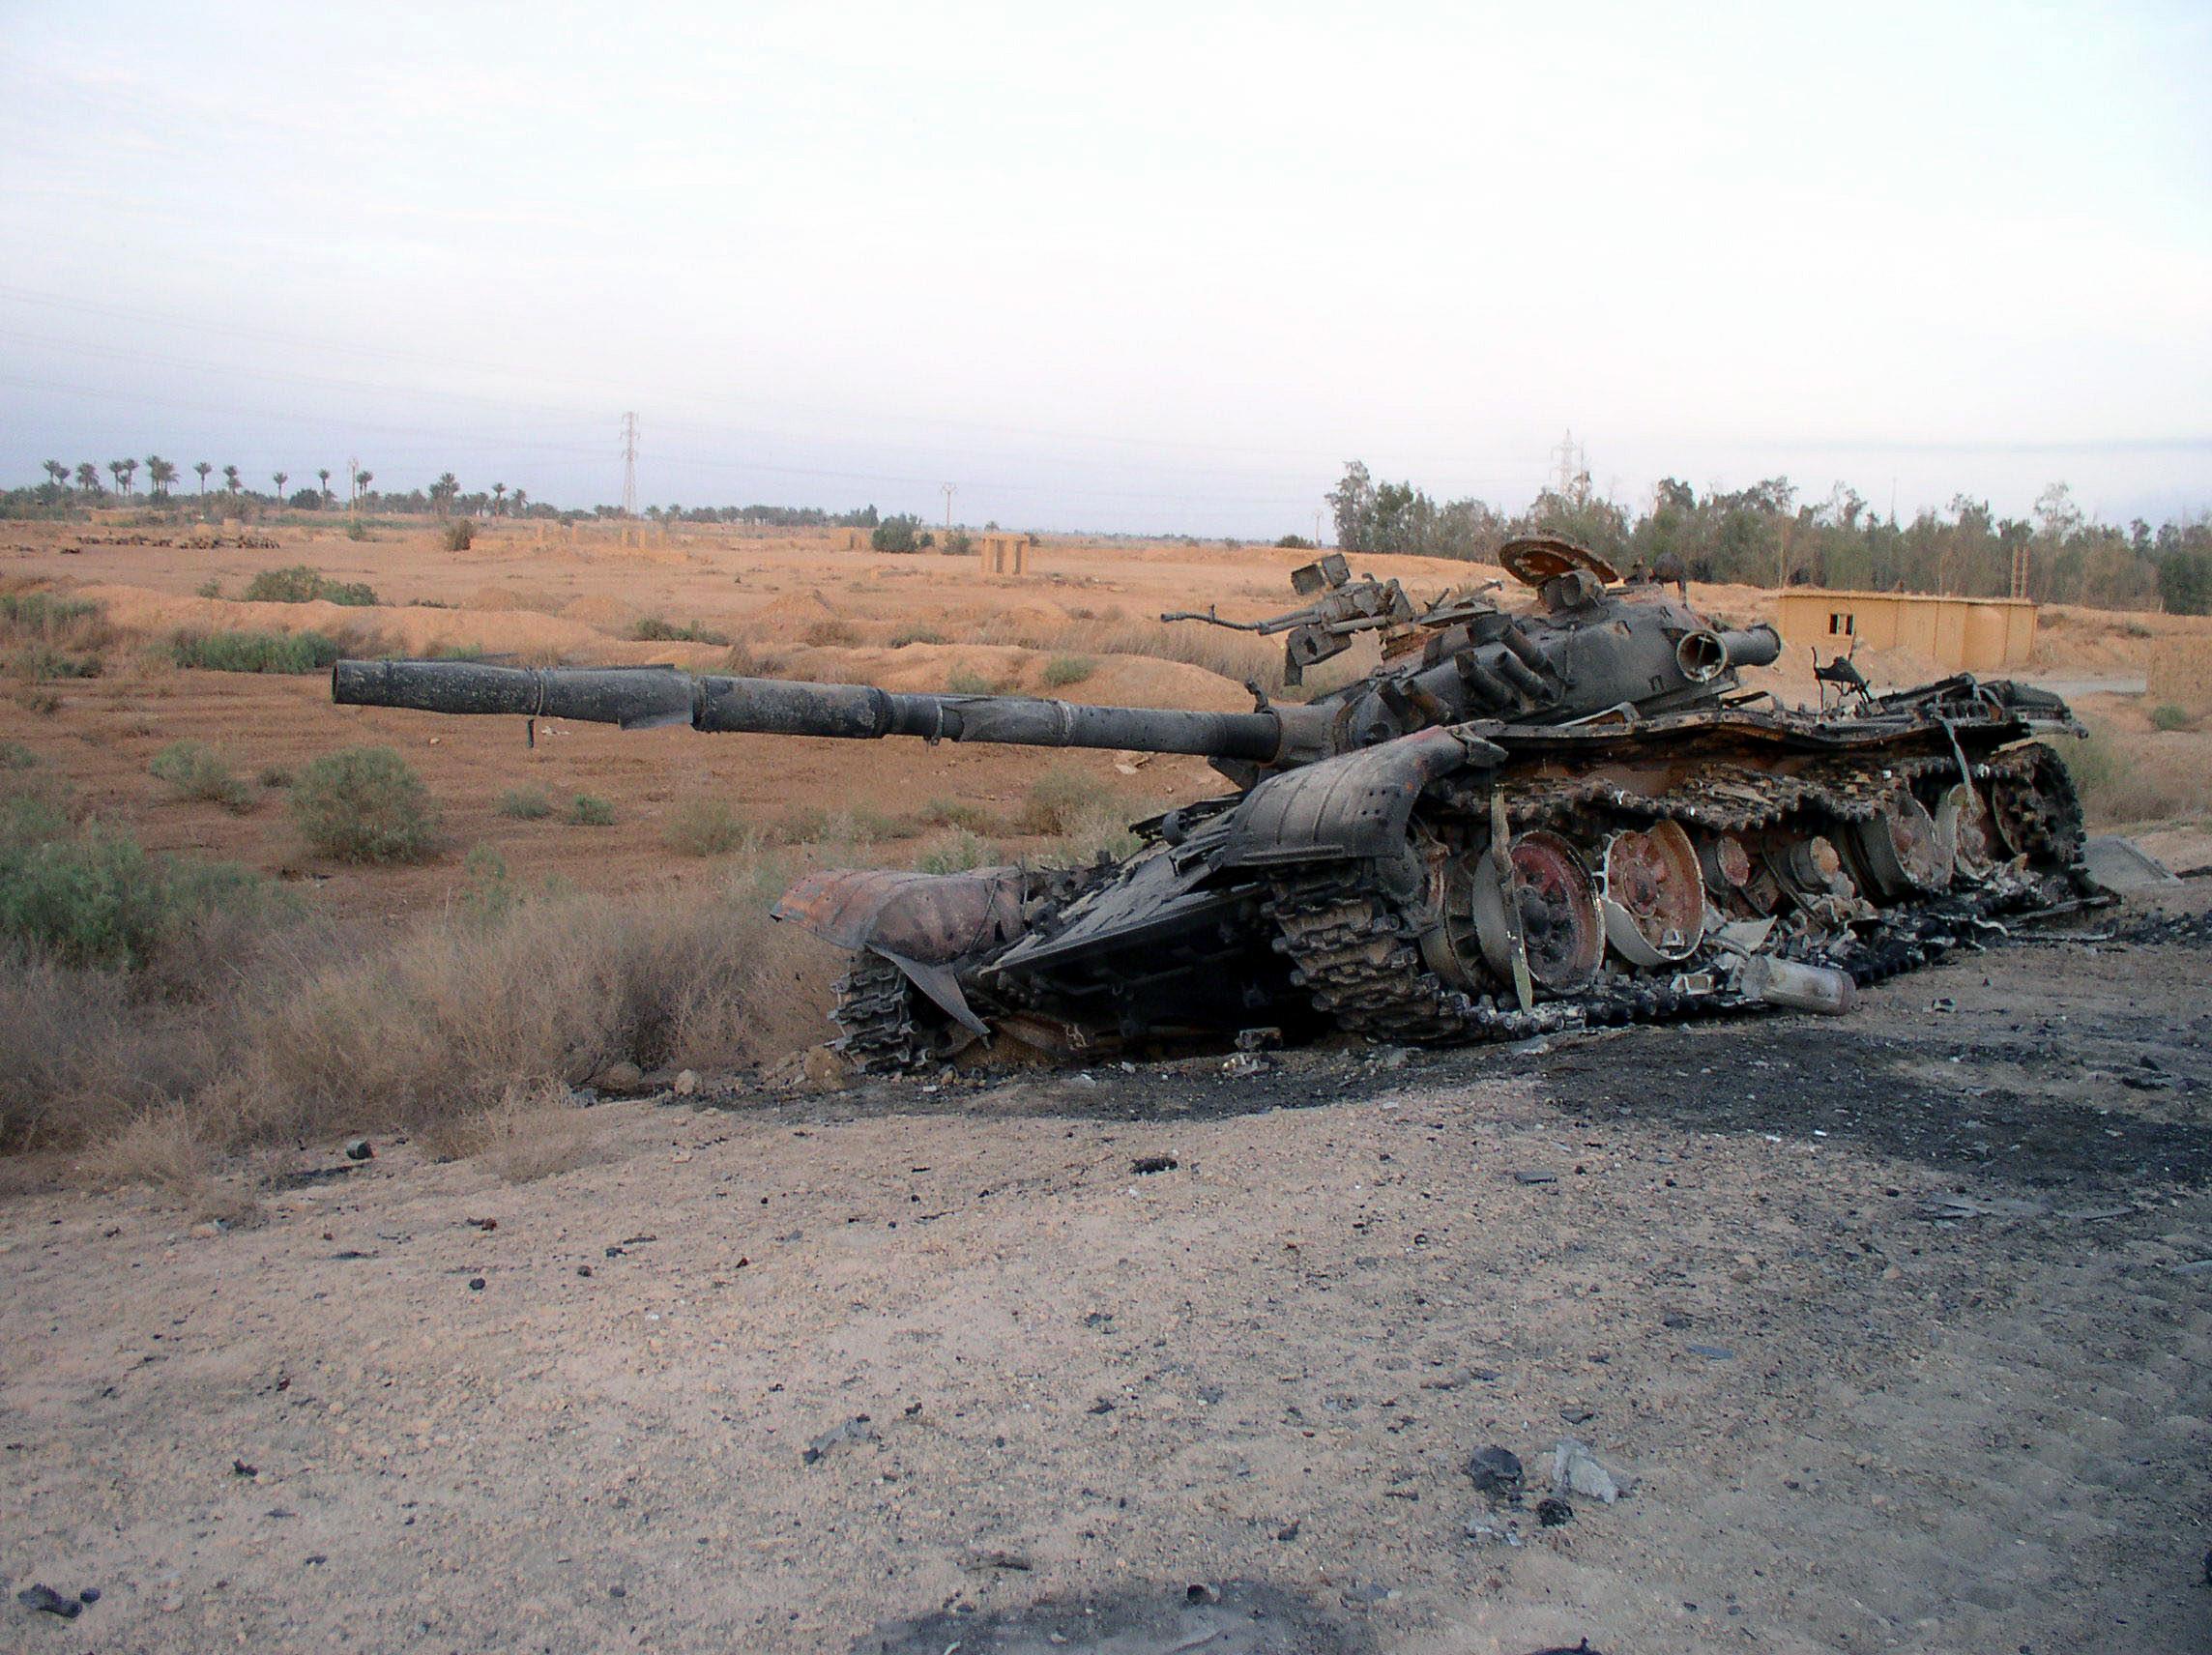 Destroyed_Iraqi_T-72_tank.JPEG